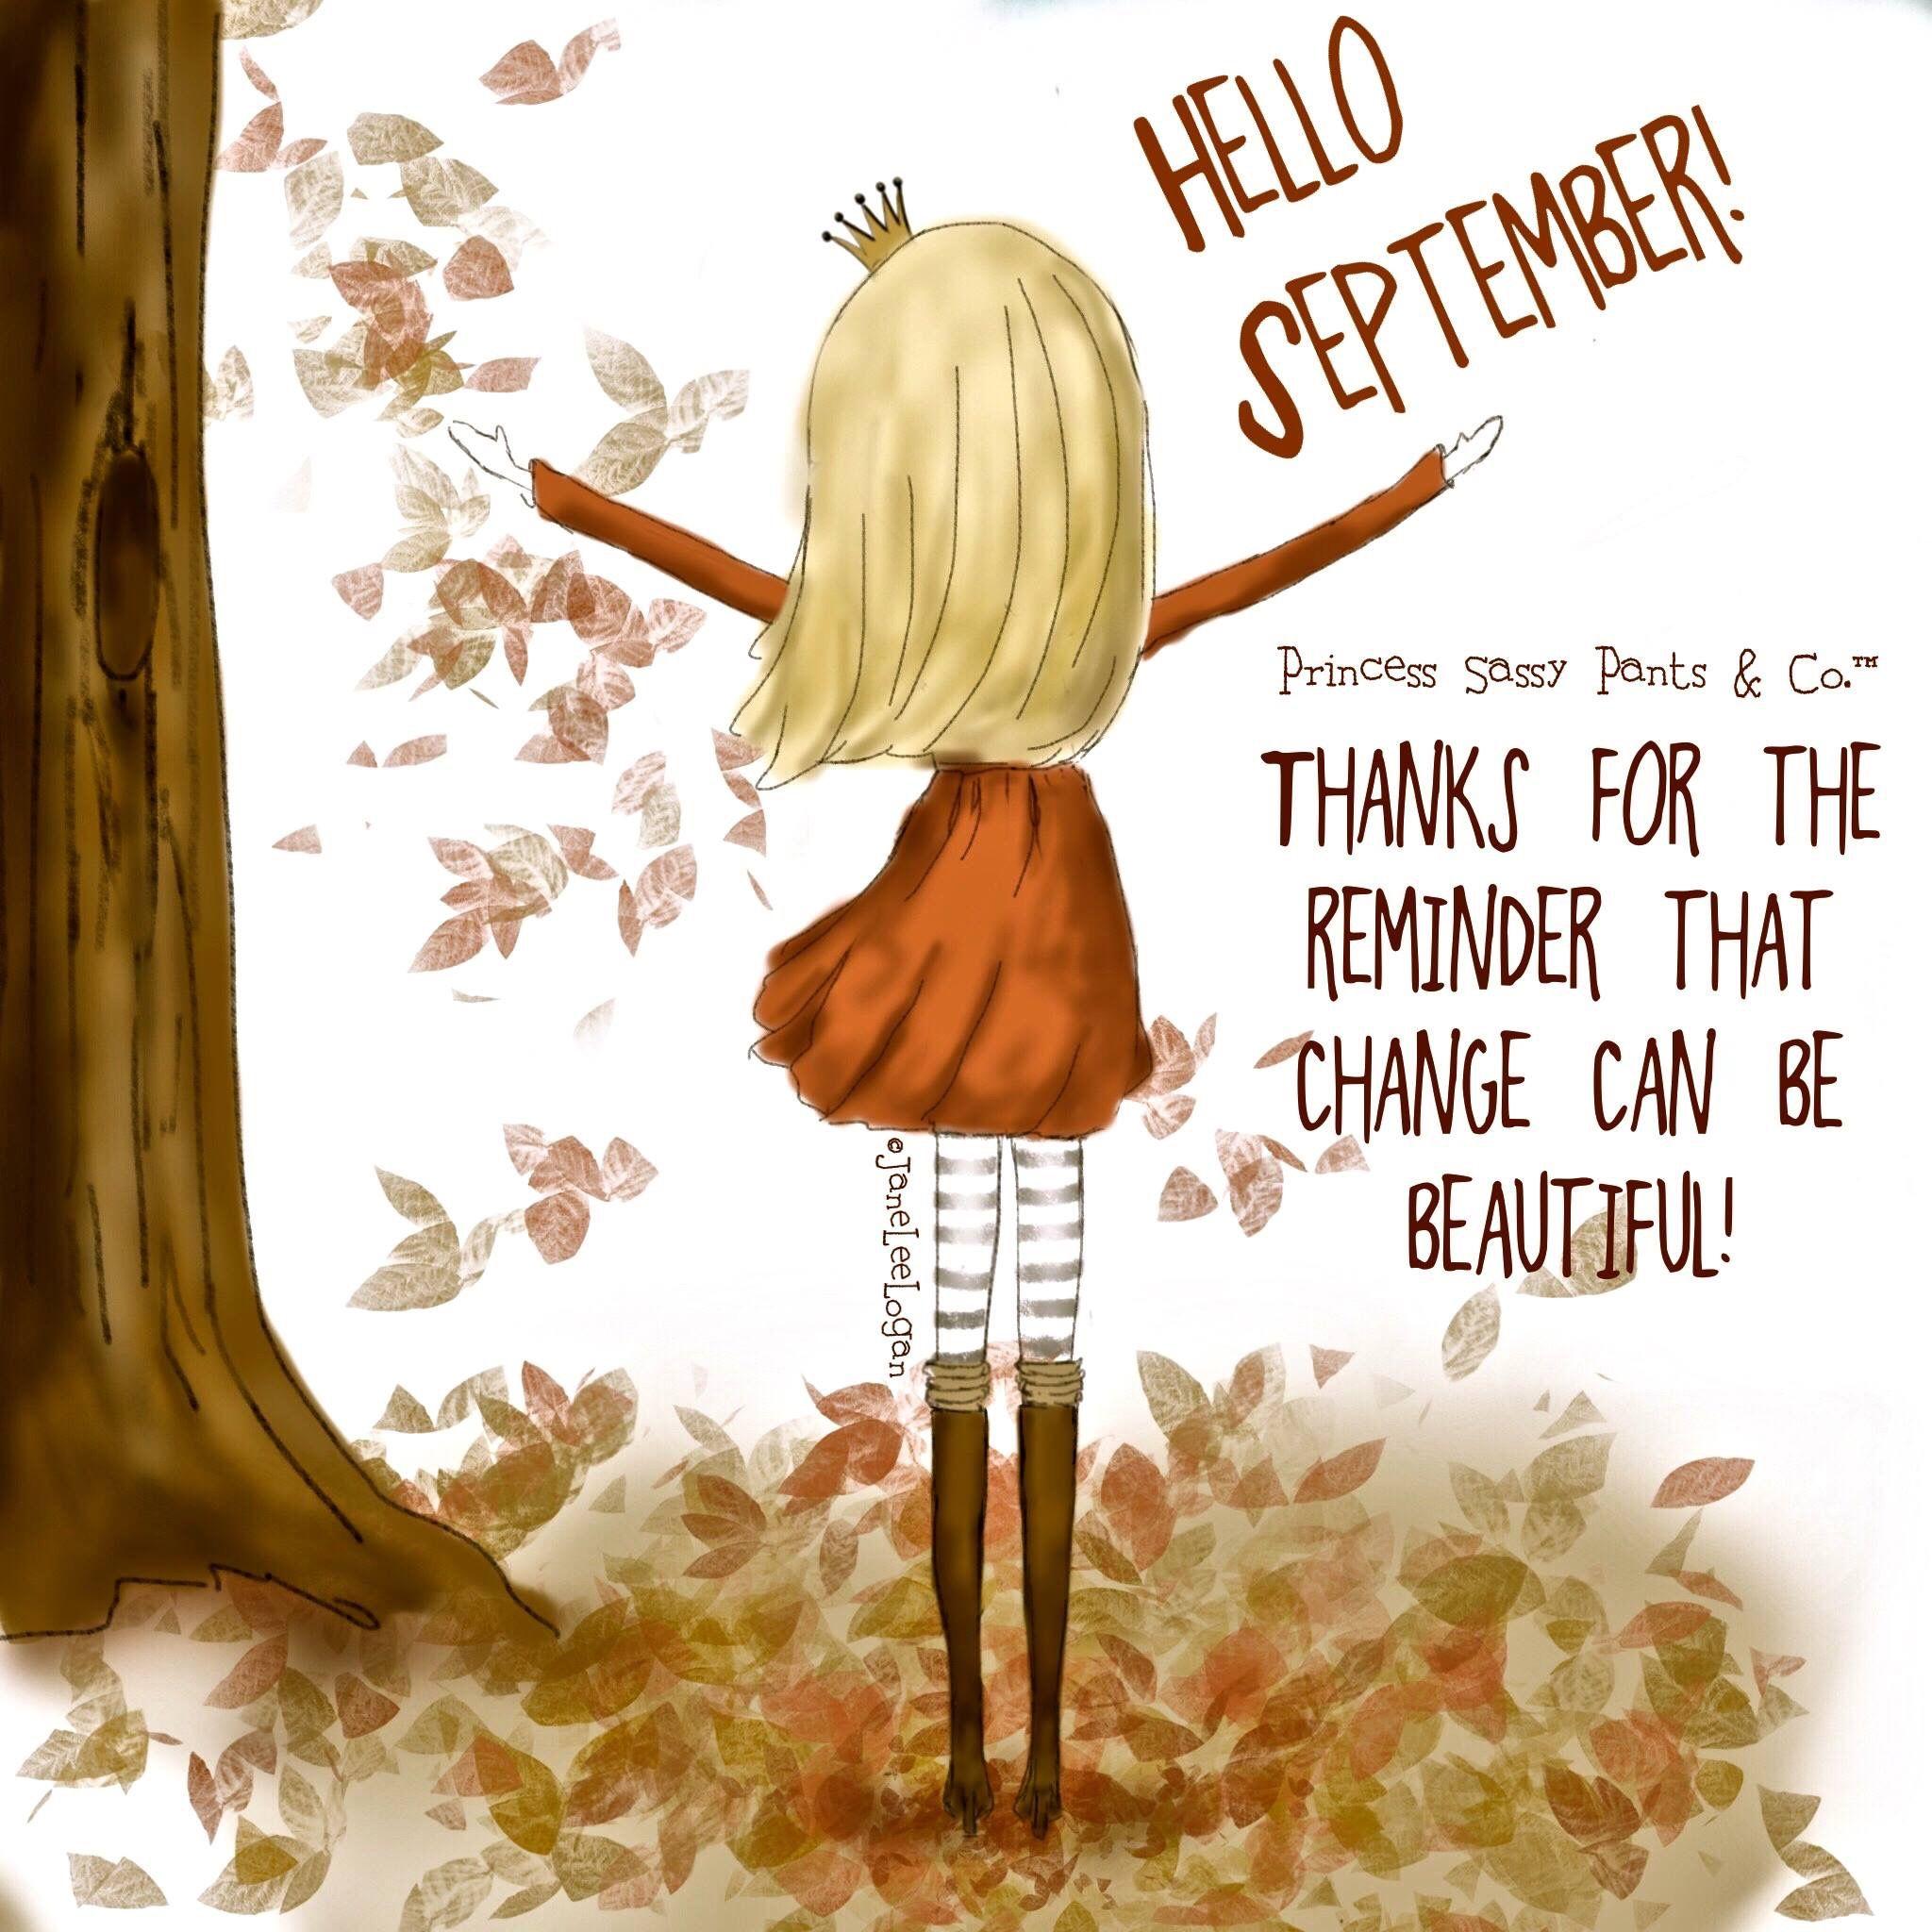 Hello September Hello september images, September quotes